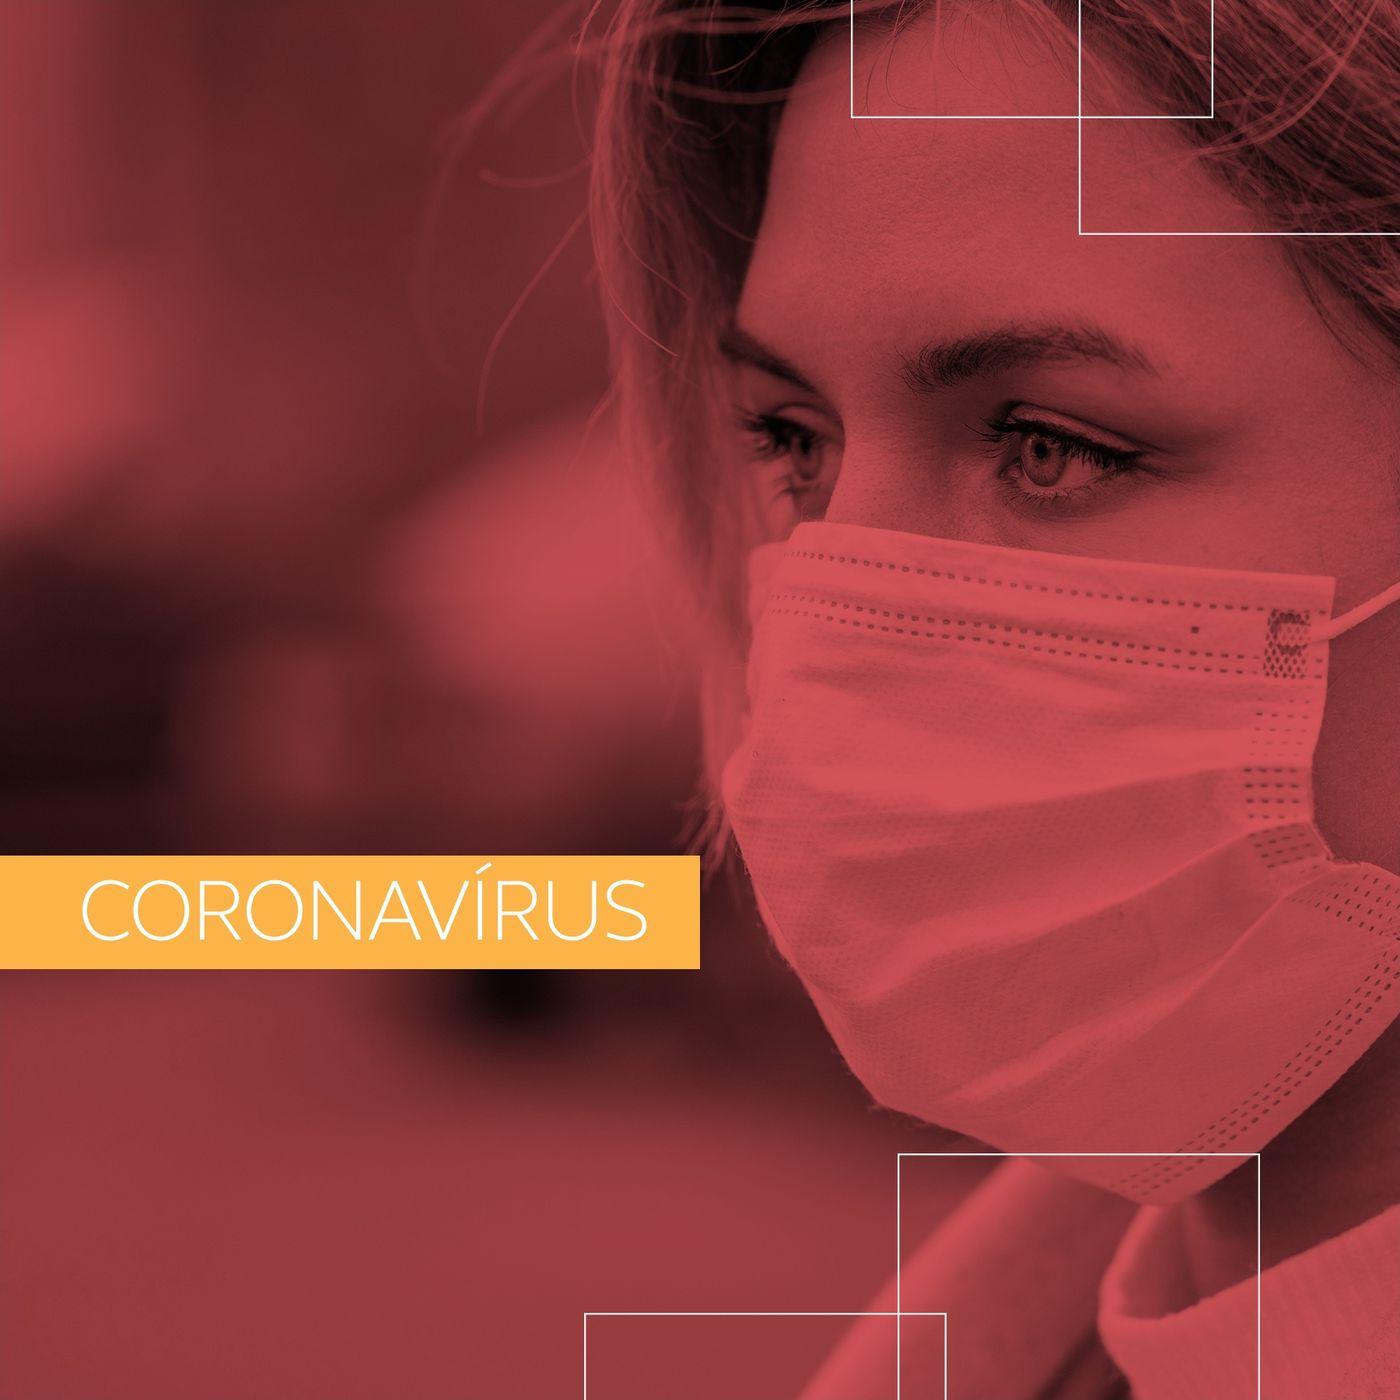 Coronavírus e as políticas de saúde pública